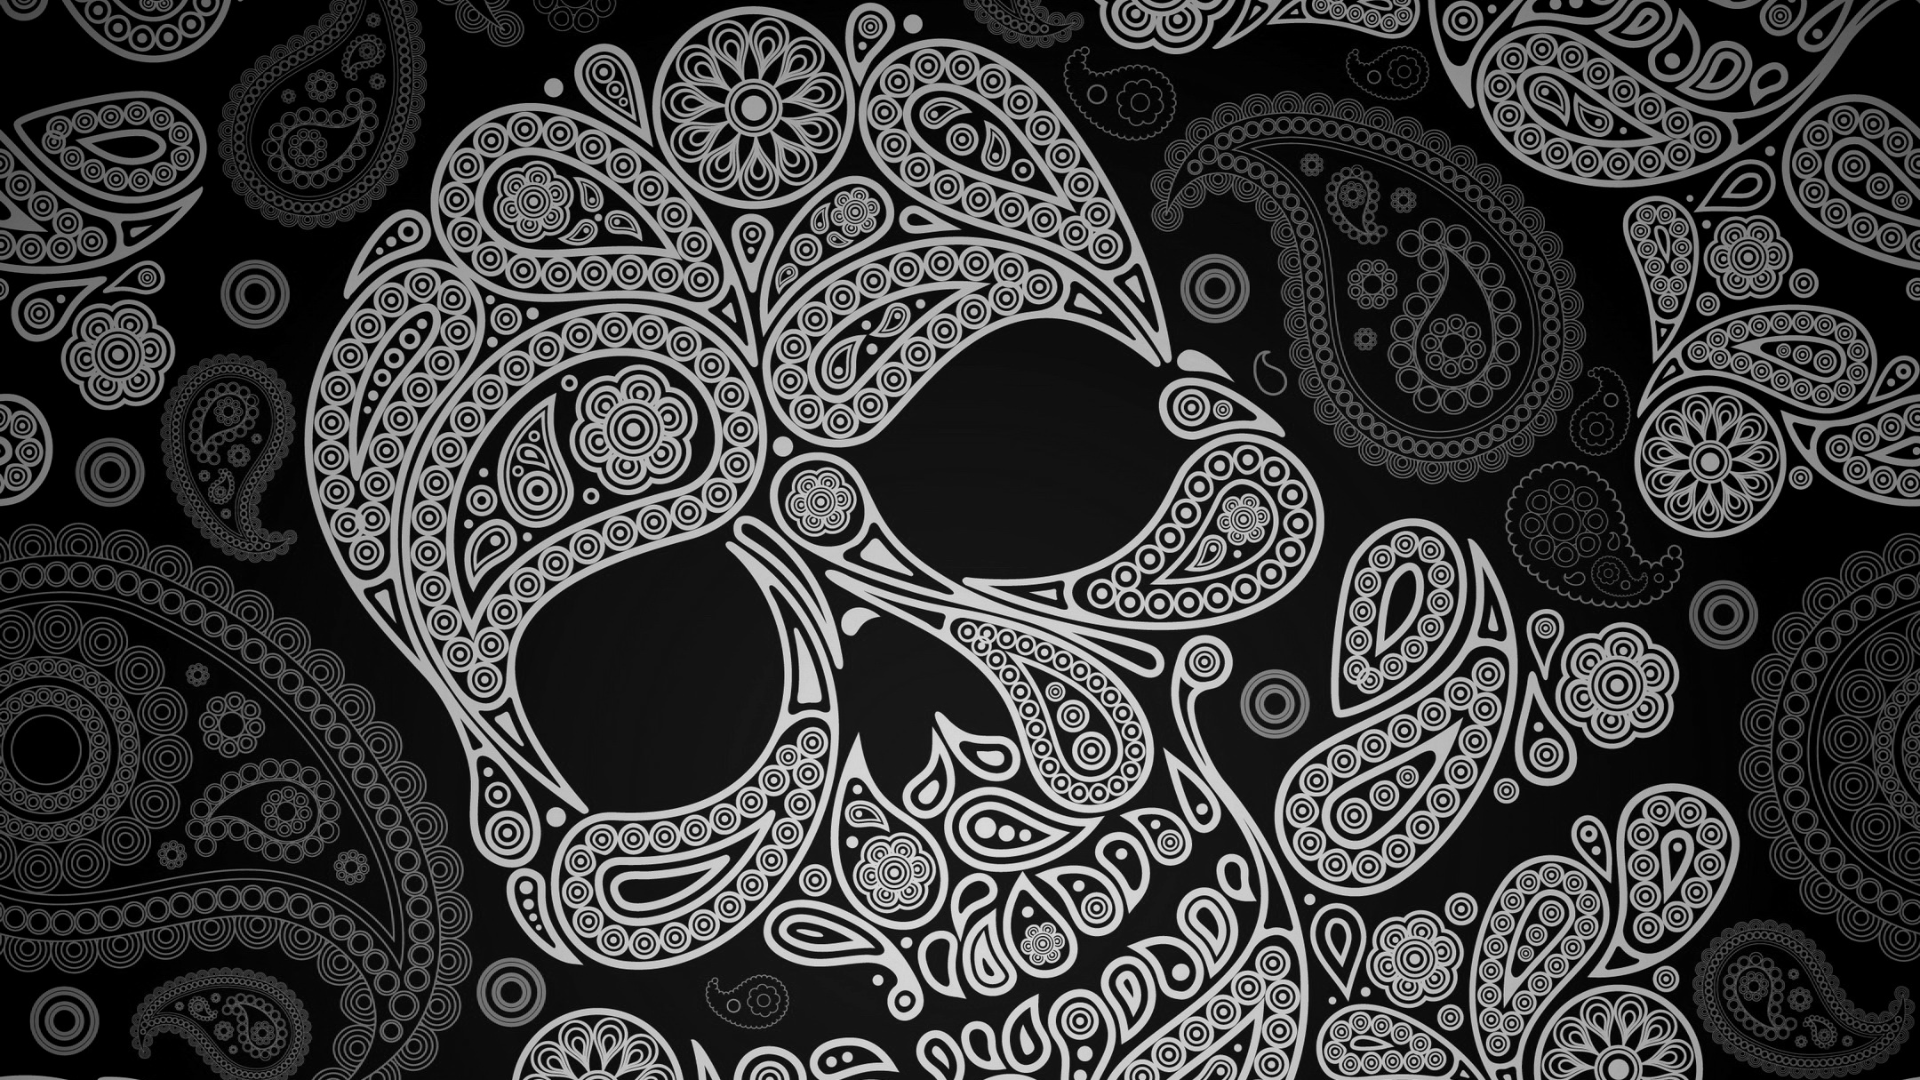 Nexus 5 Wallpaper 1920x1080: Skull Wallpaper For PC